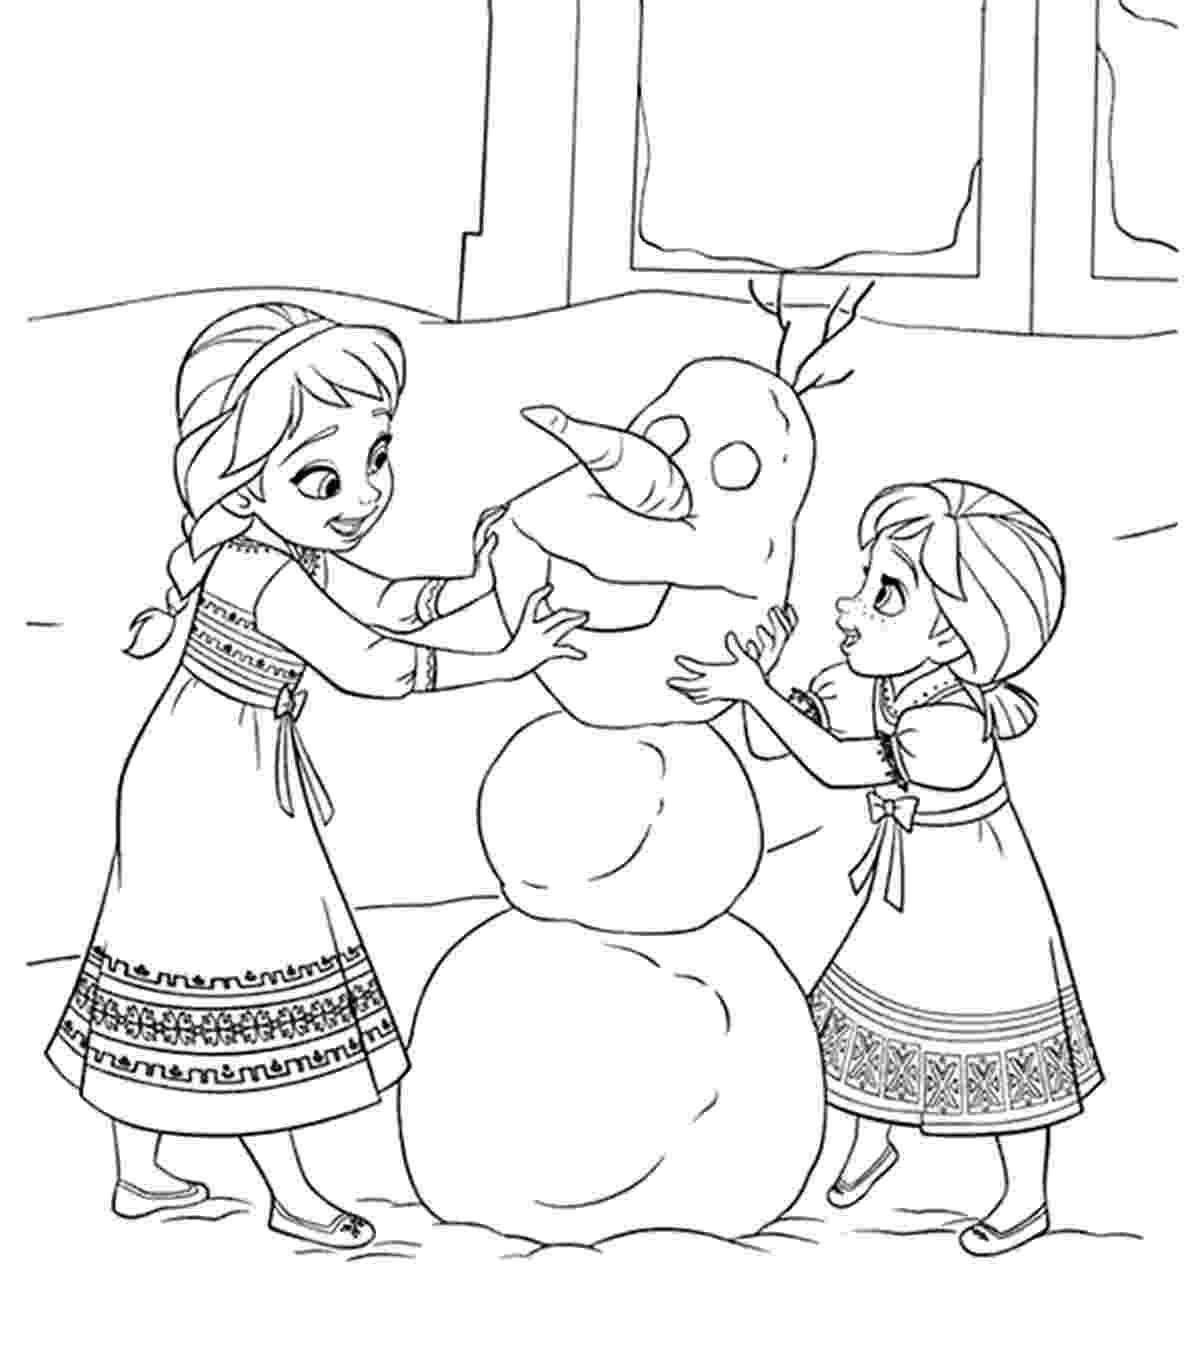 frozen color pages free printables for the disney movie frozen skgaleana color frozen pages